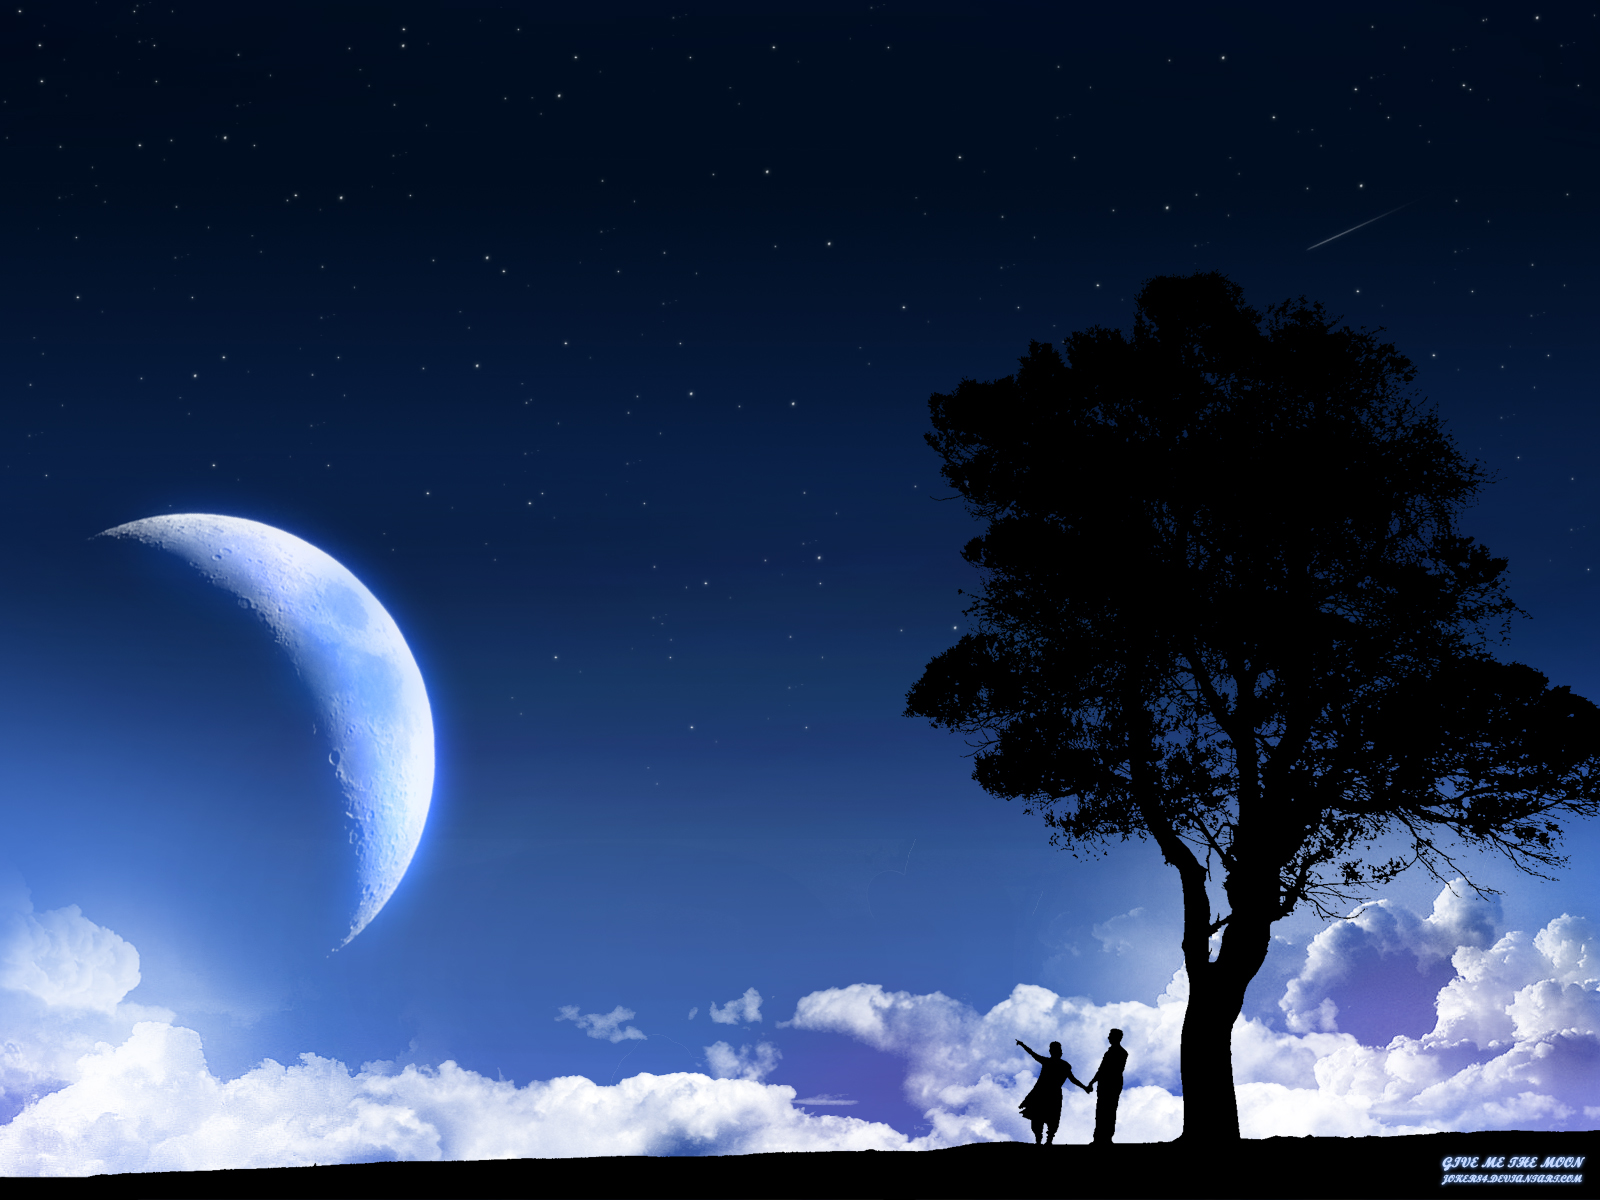 Romantic Sickle Moon - Romantic Sickle Moon